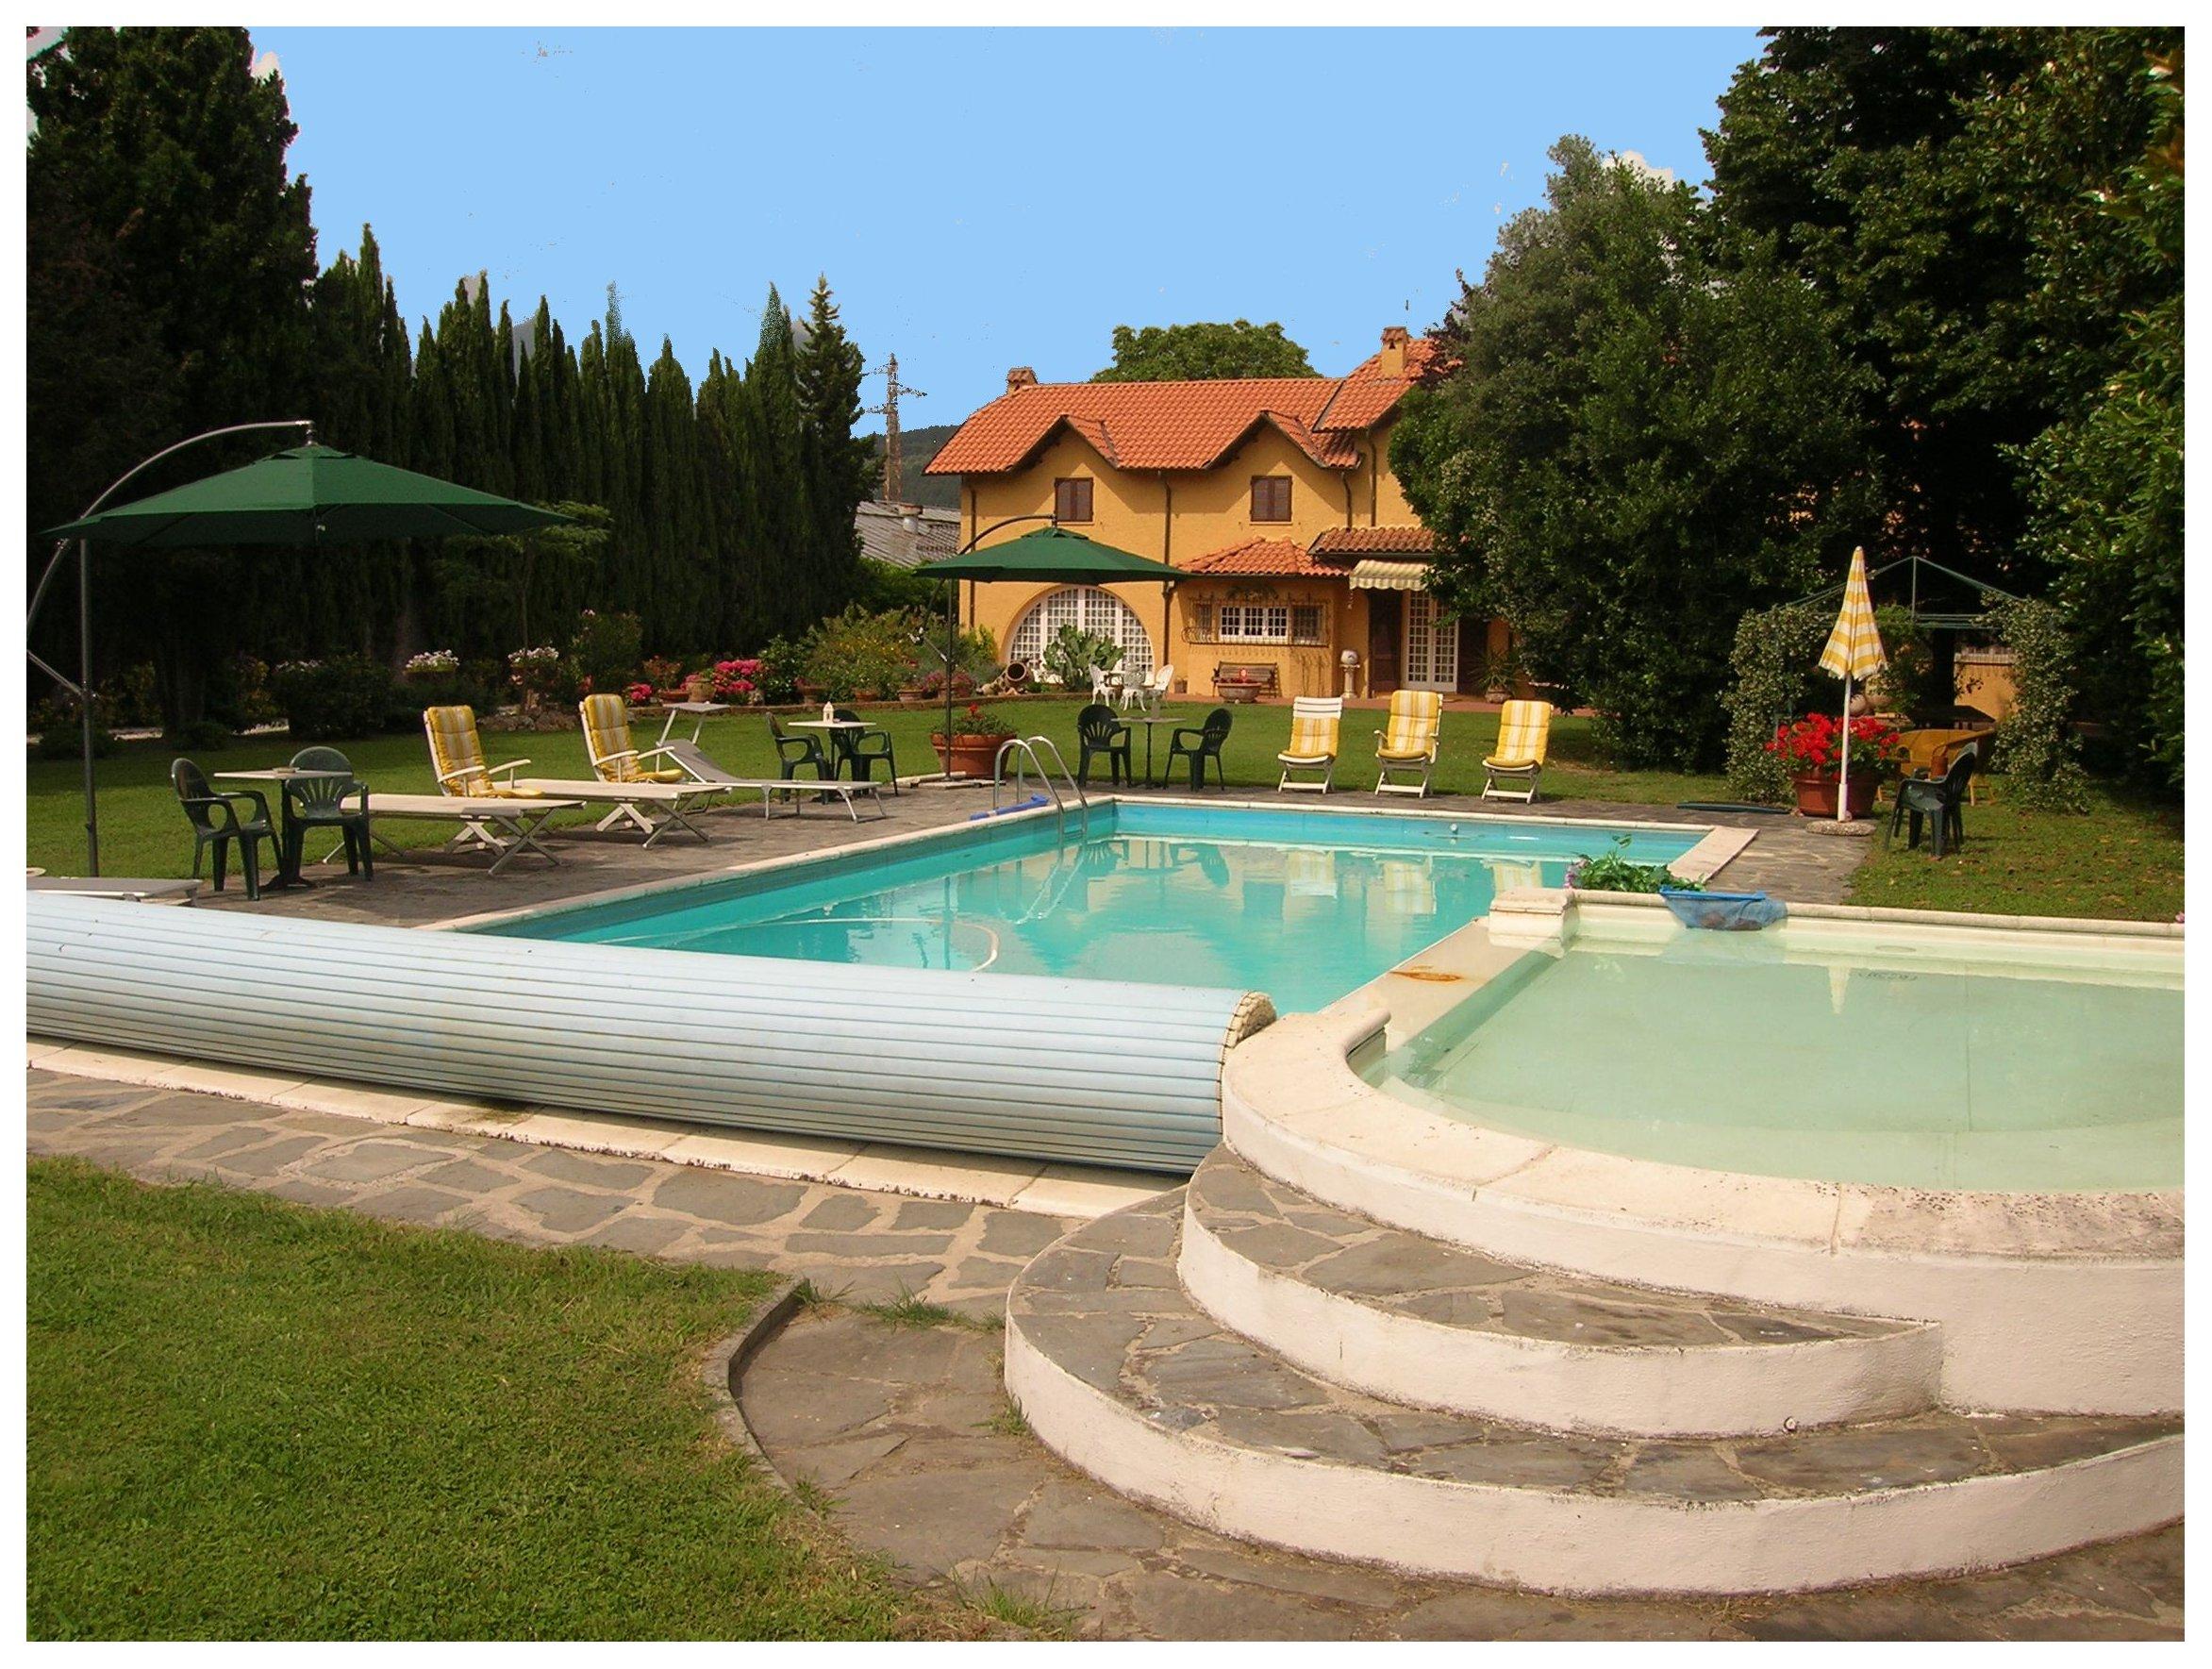 Moderna villa con la piscina - Ville con piscina ...